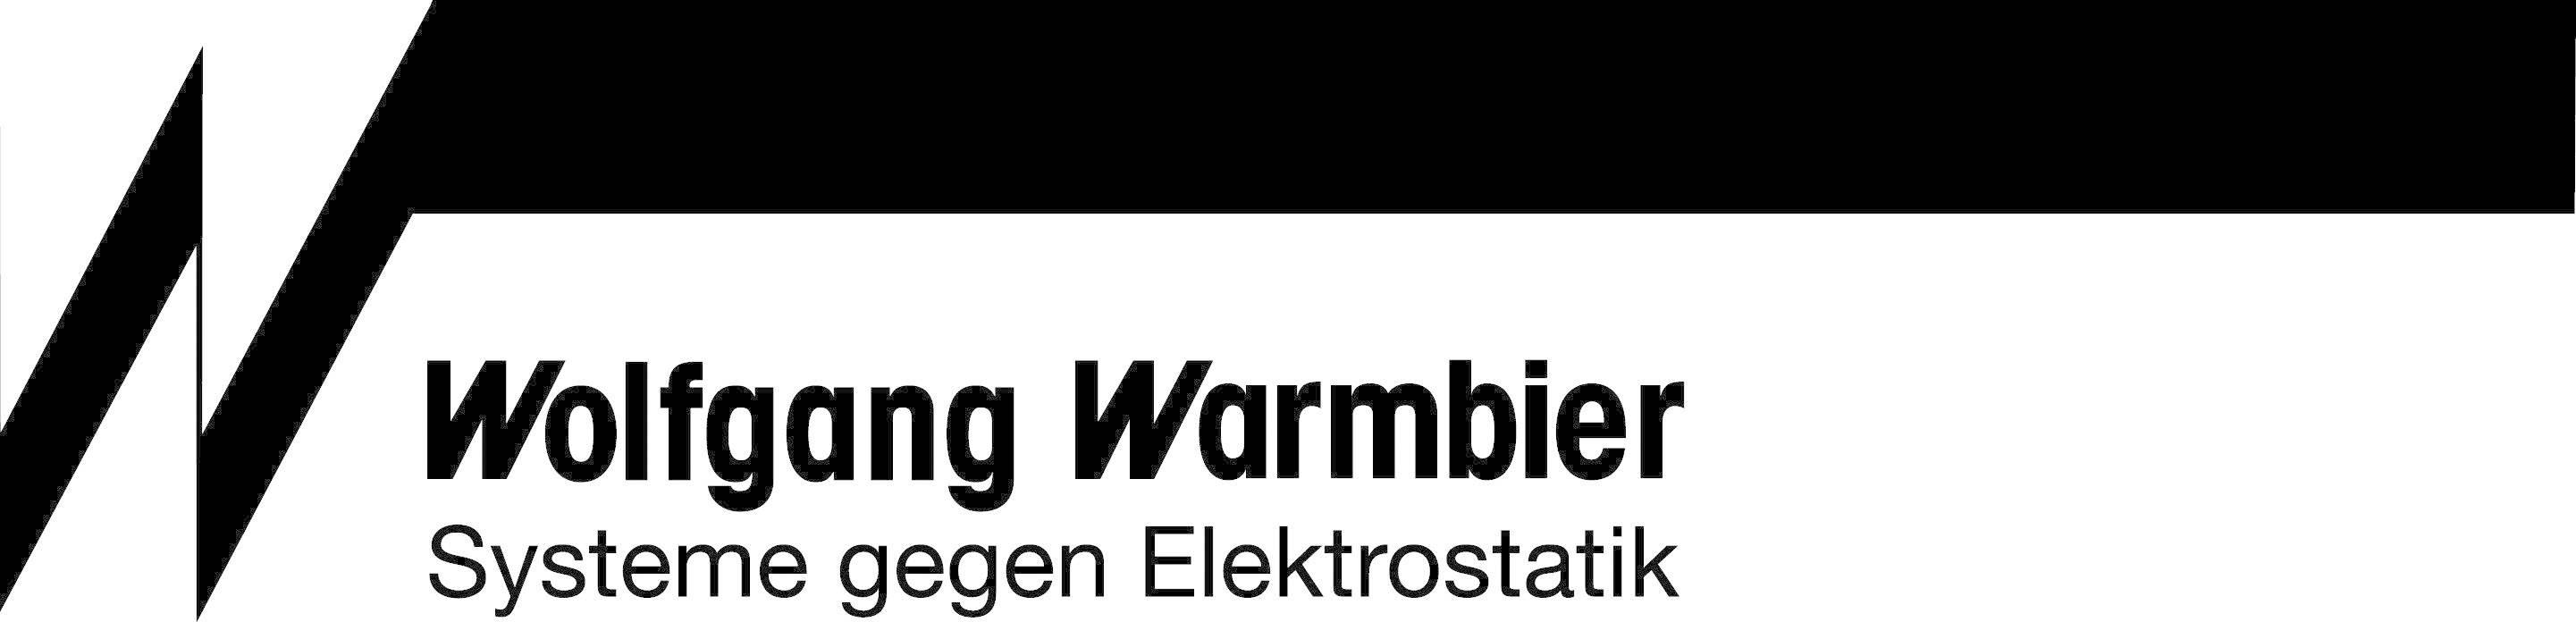 Wolfgang Warmbier